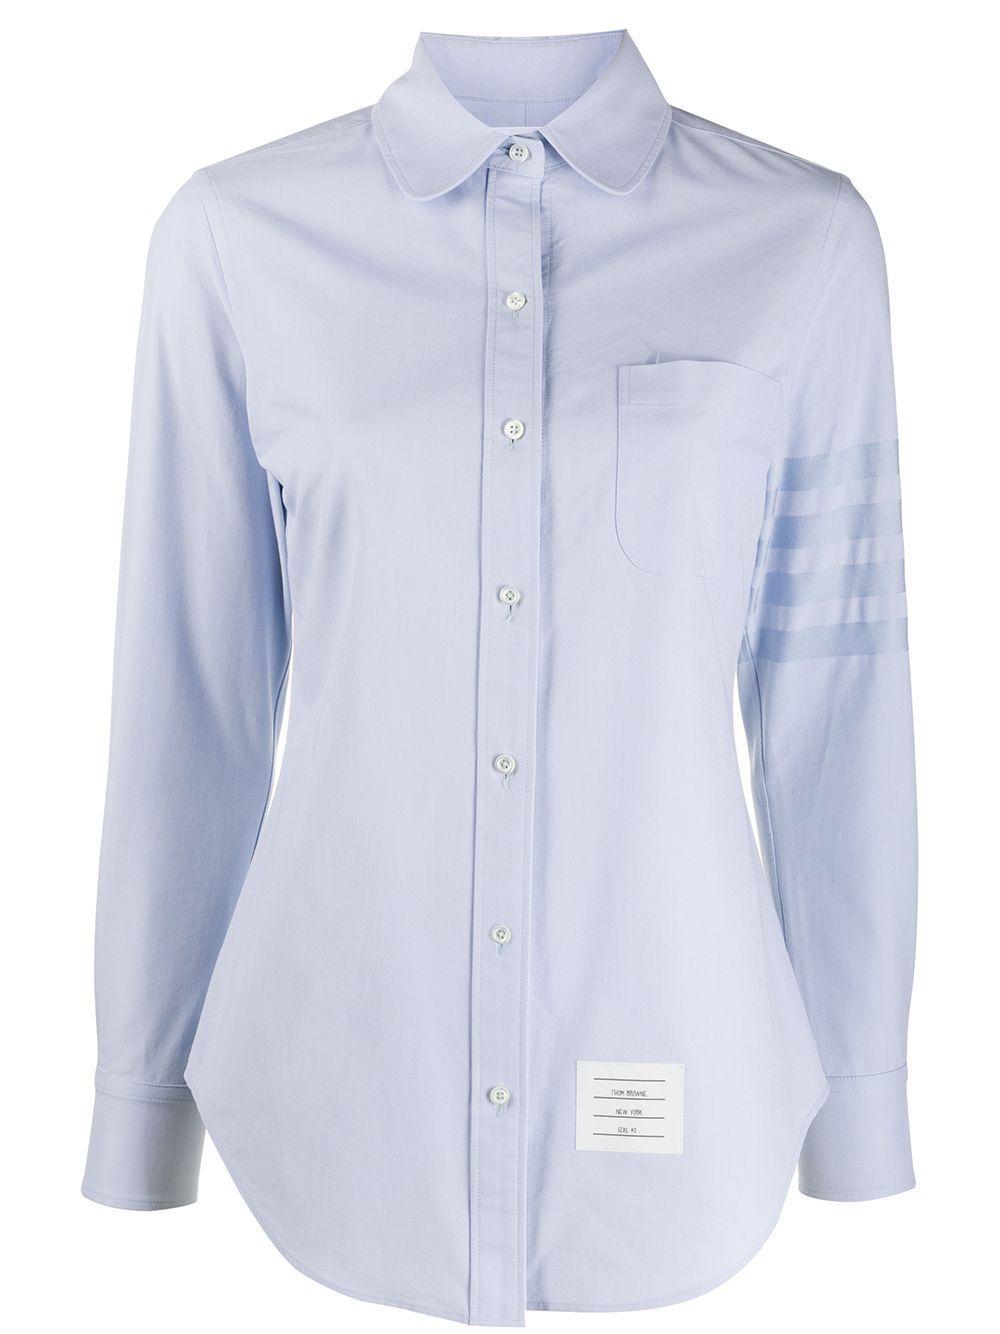 Thom Browne LIGHT BLUE CLASSIC COLLAR SHIRT